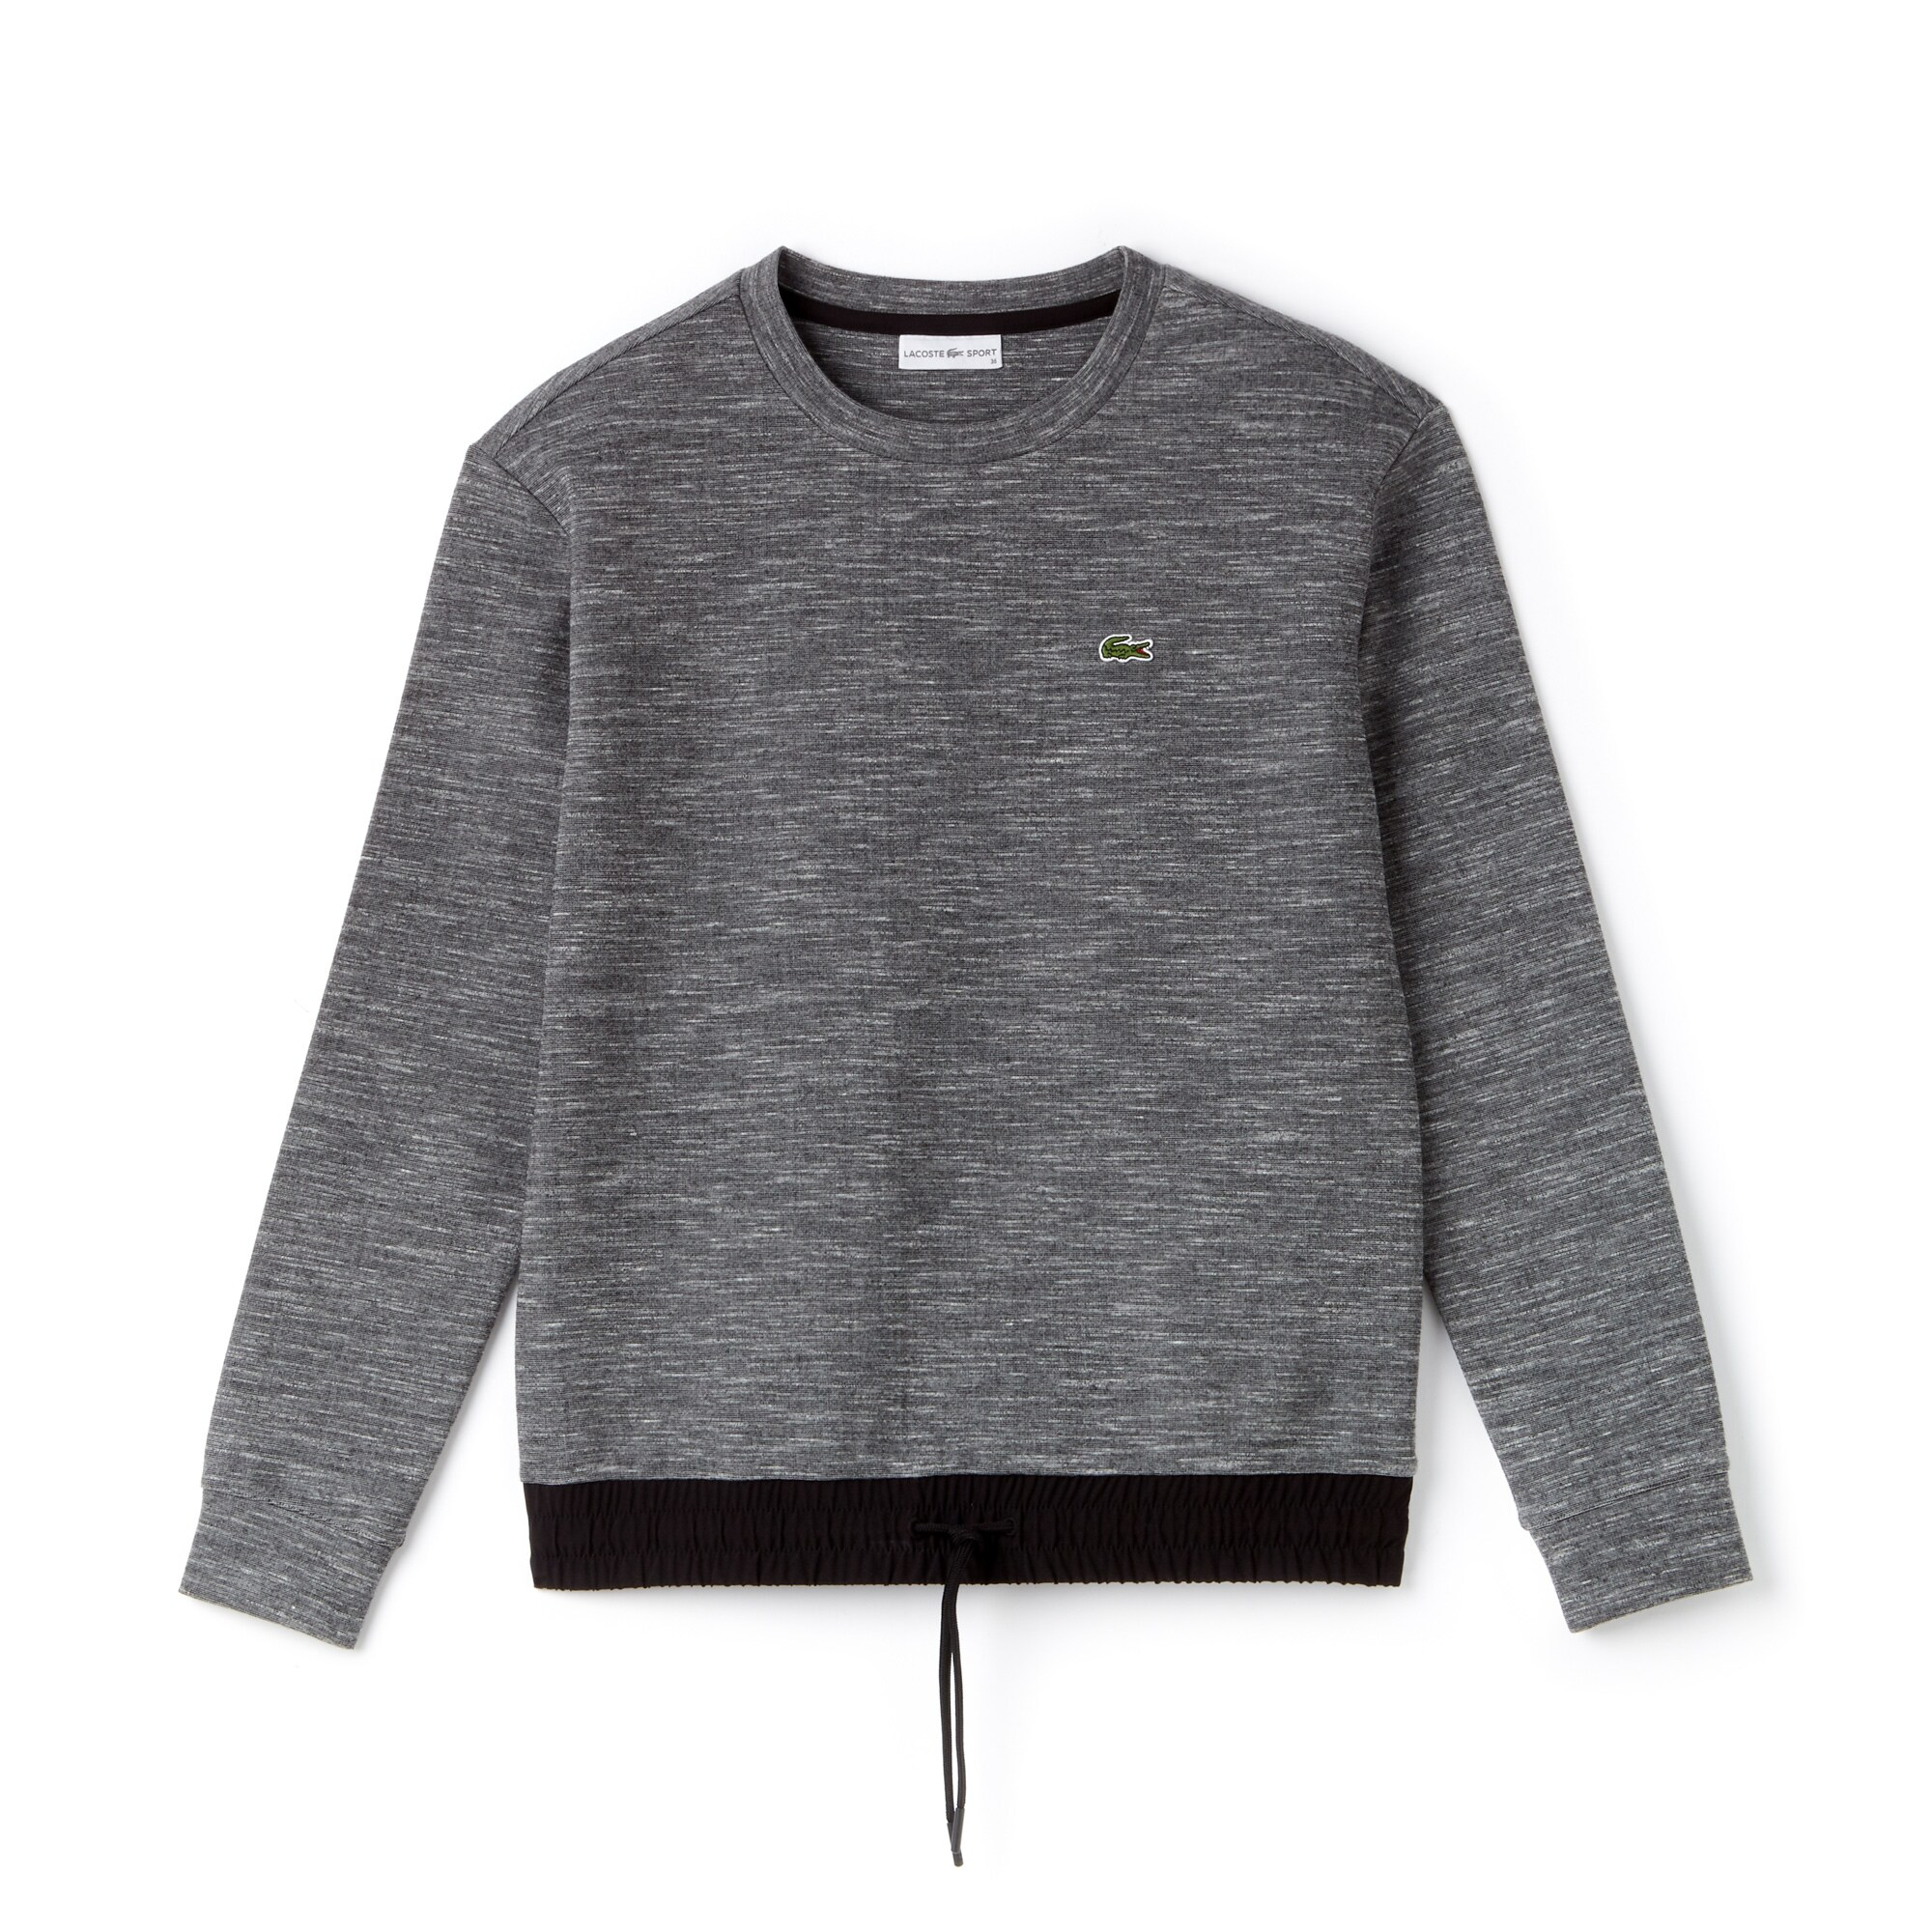 Damen LACOSTE SPORT Fleece und Taft Tennis-Sweatshirt